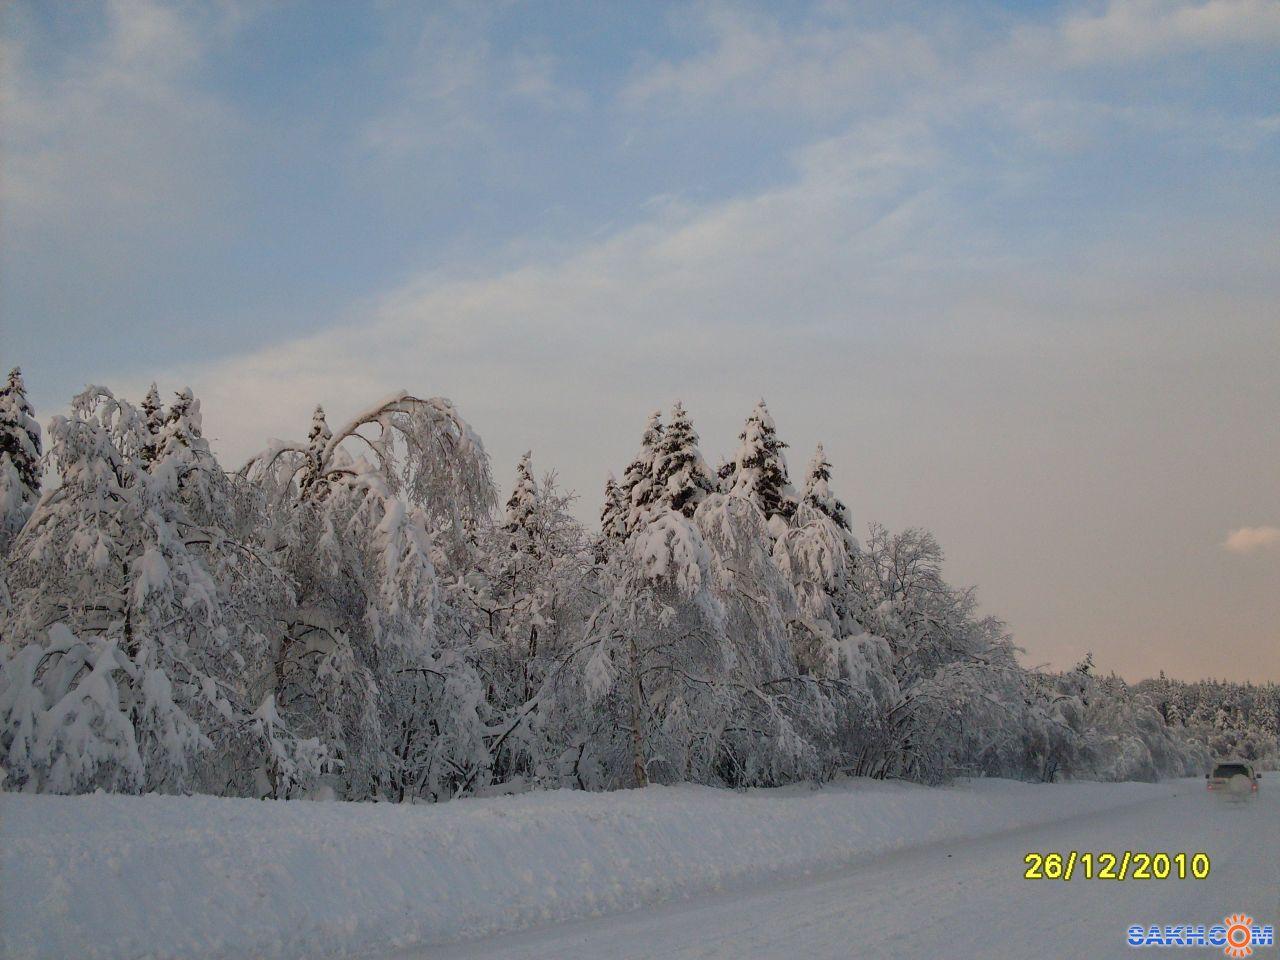 mrnsin: Южно-Сахалинск-Углегорск.Покатушки после циклона